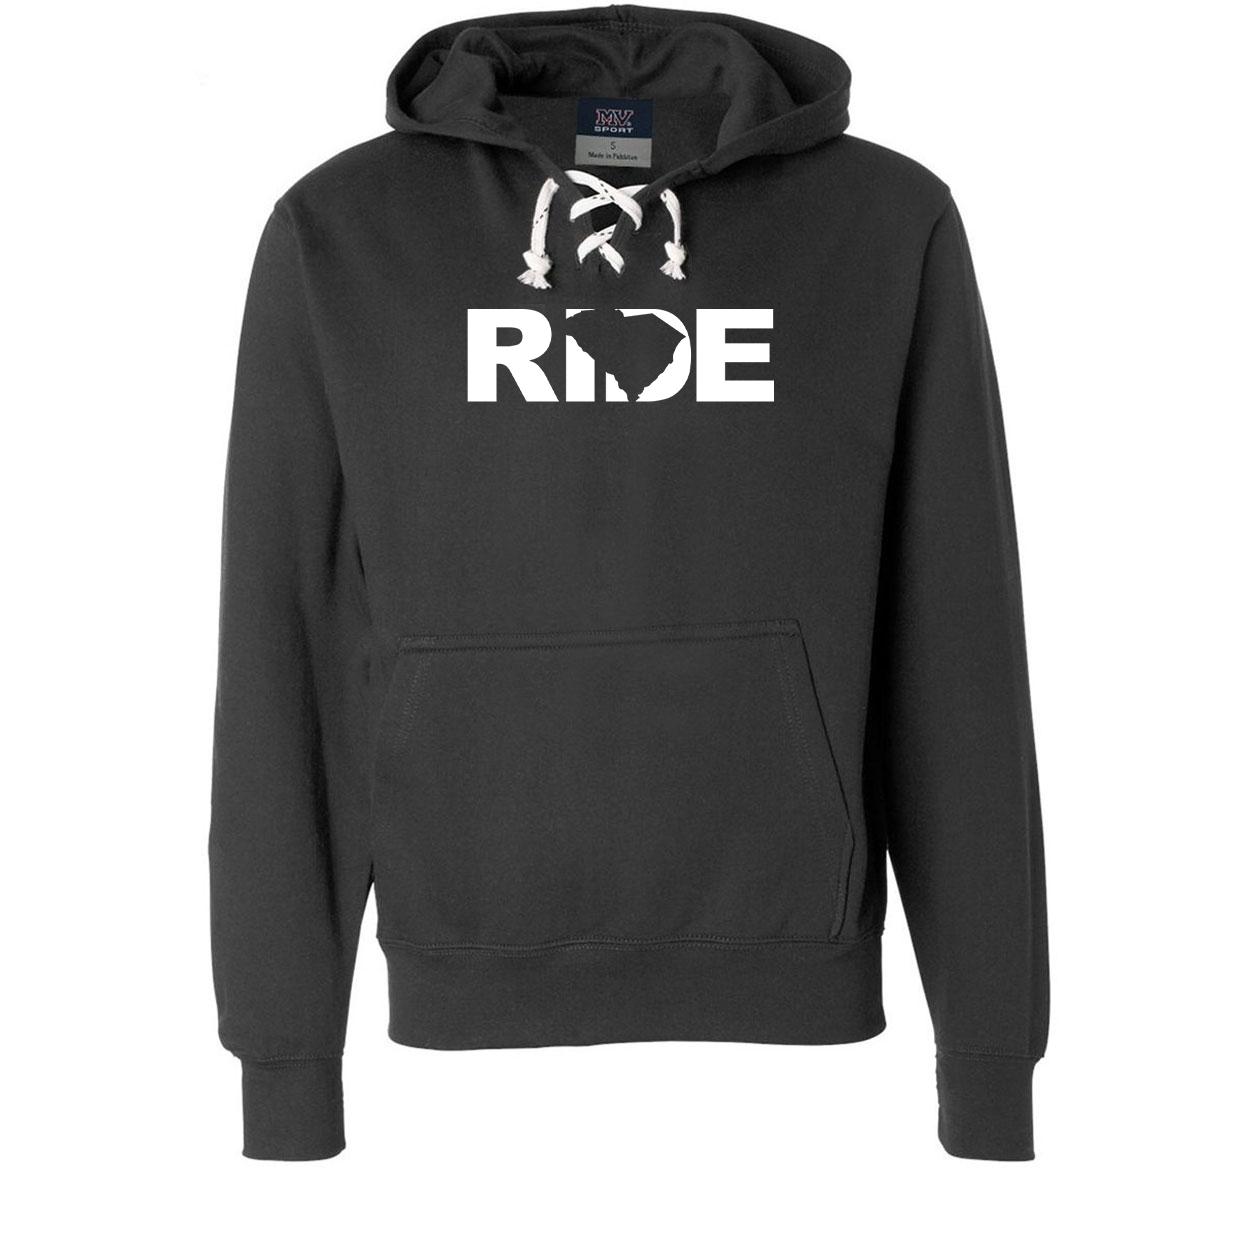 Ride South Carolina Classic Unisex Premium Hockey Sweatshirt Black (White Logo)